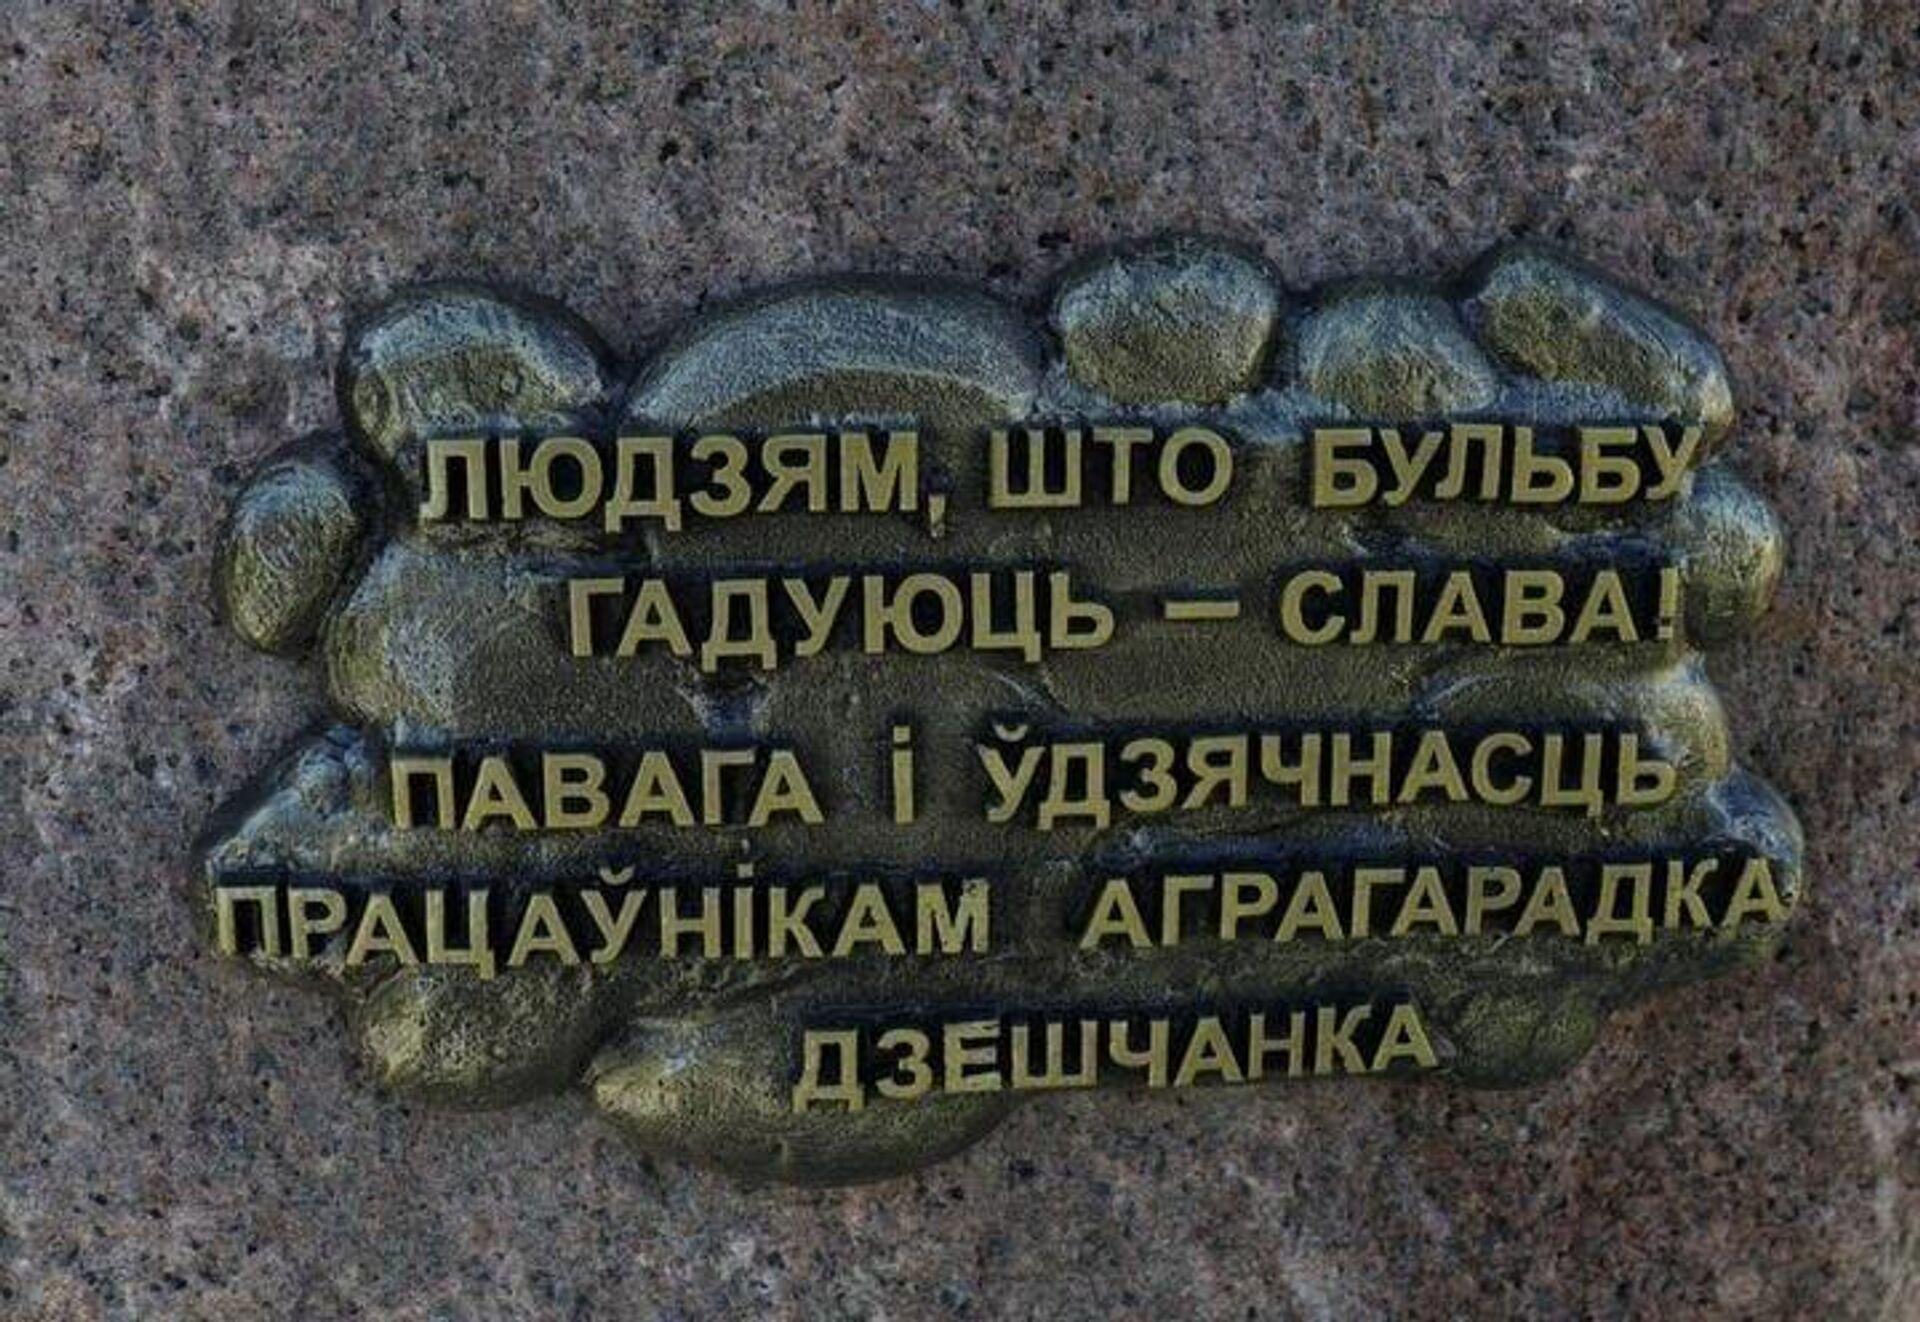 Памятник картошке установили в Беларуси - Sputnik Беларусь, 1920, 13.09.2021